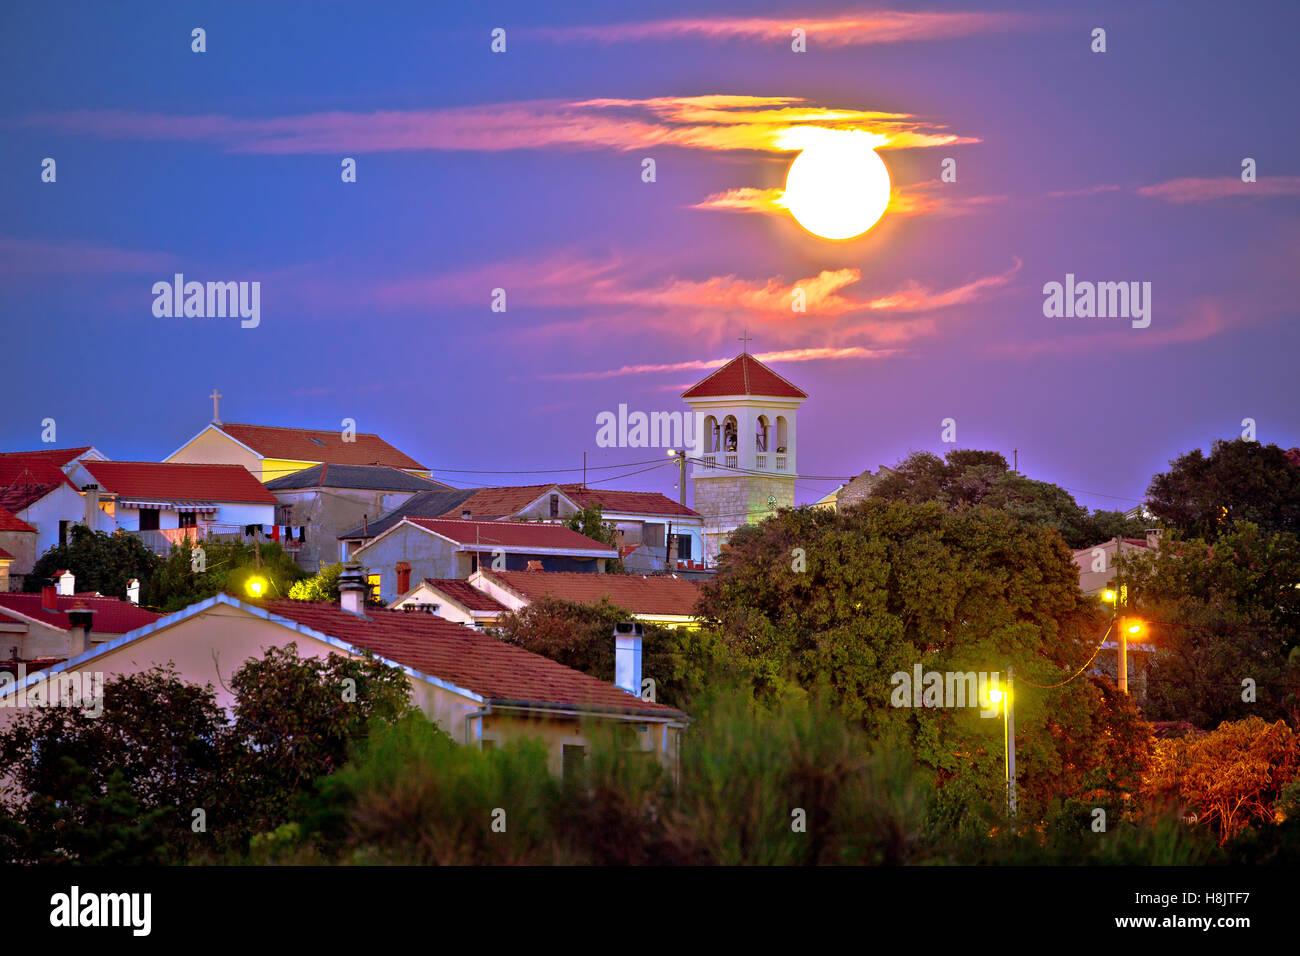 Zadar Bokanjac suburbio vista nocturna, Dalmacia, Croacia Foto de stock